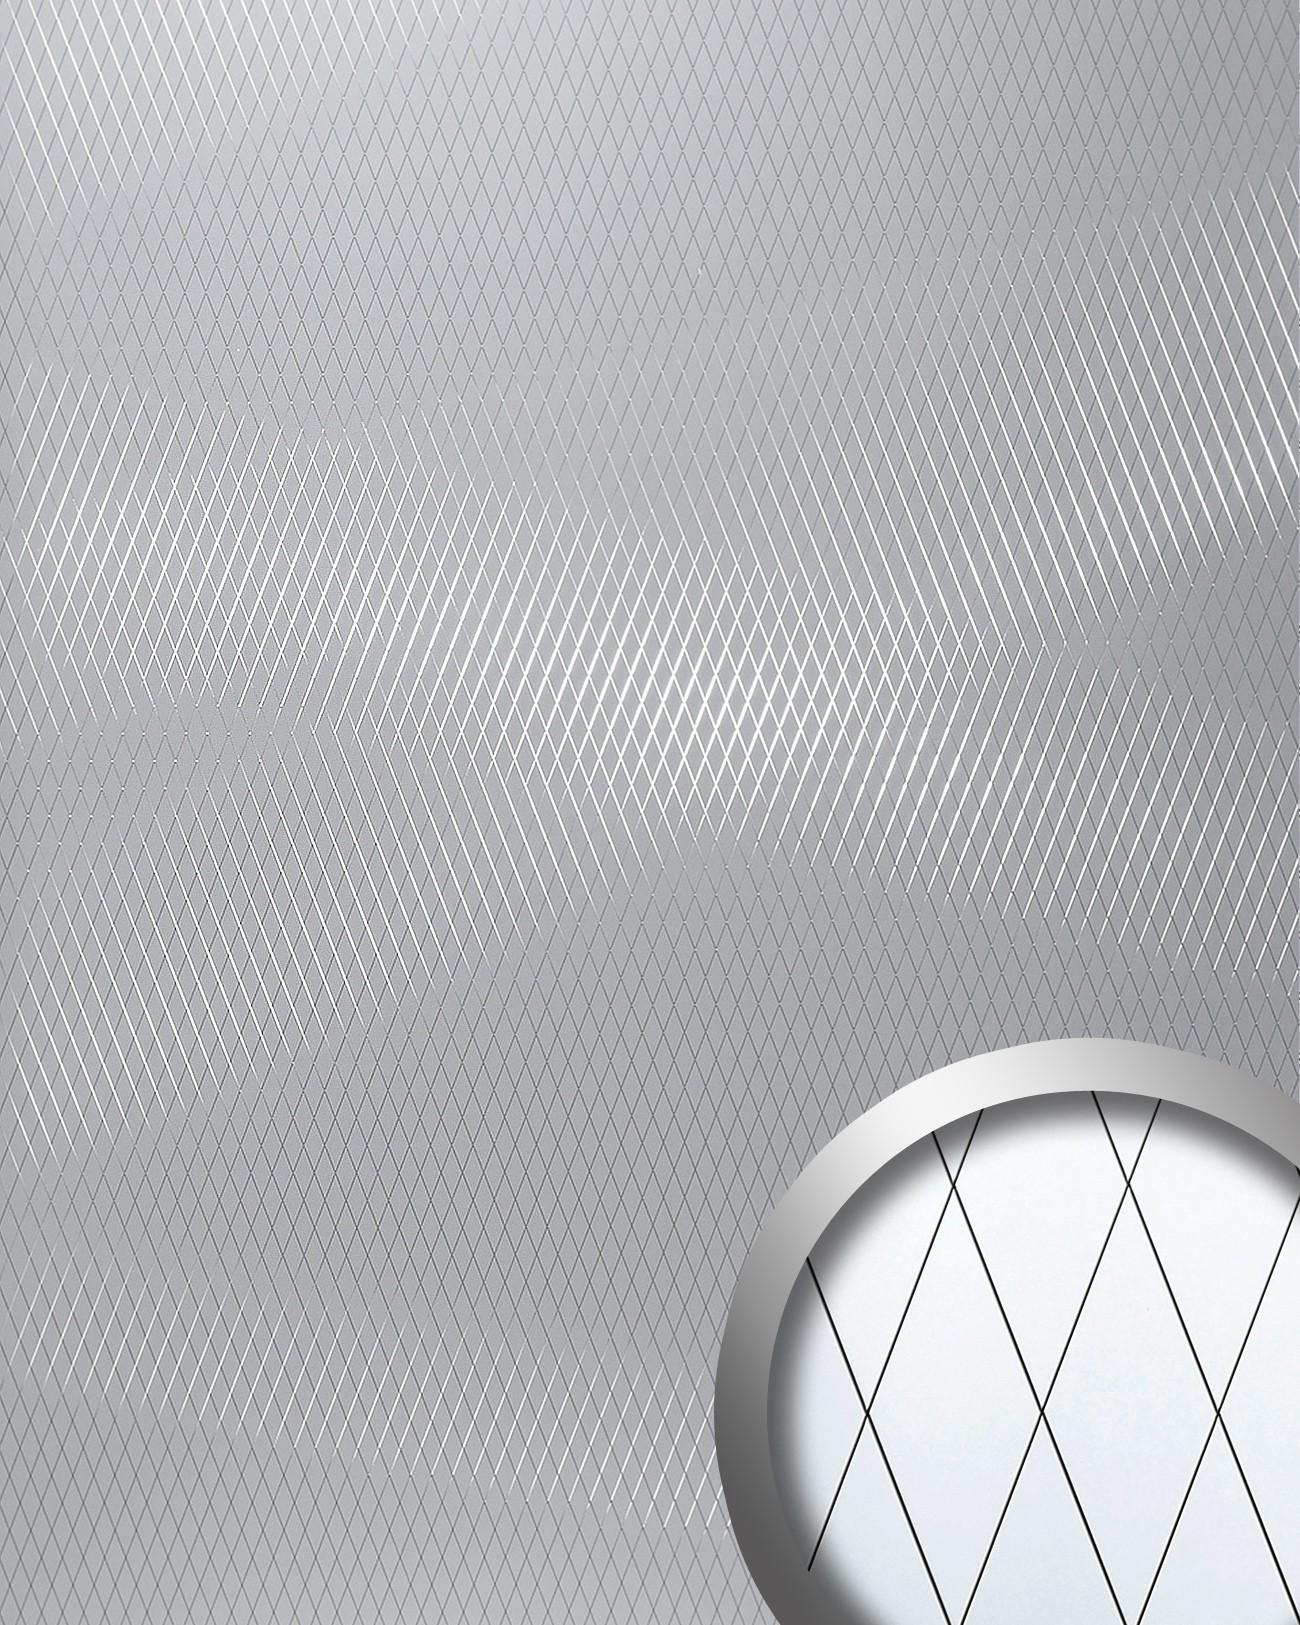 Panel decorativo revestimiento mural autoadhesivo espejo - Revestimiento pared autoadhesivo ...